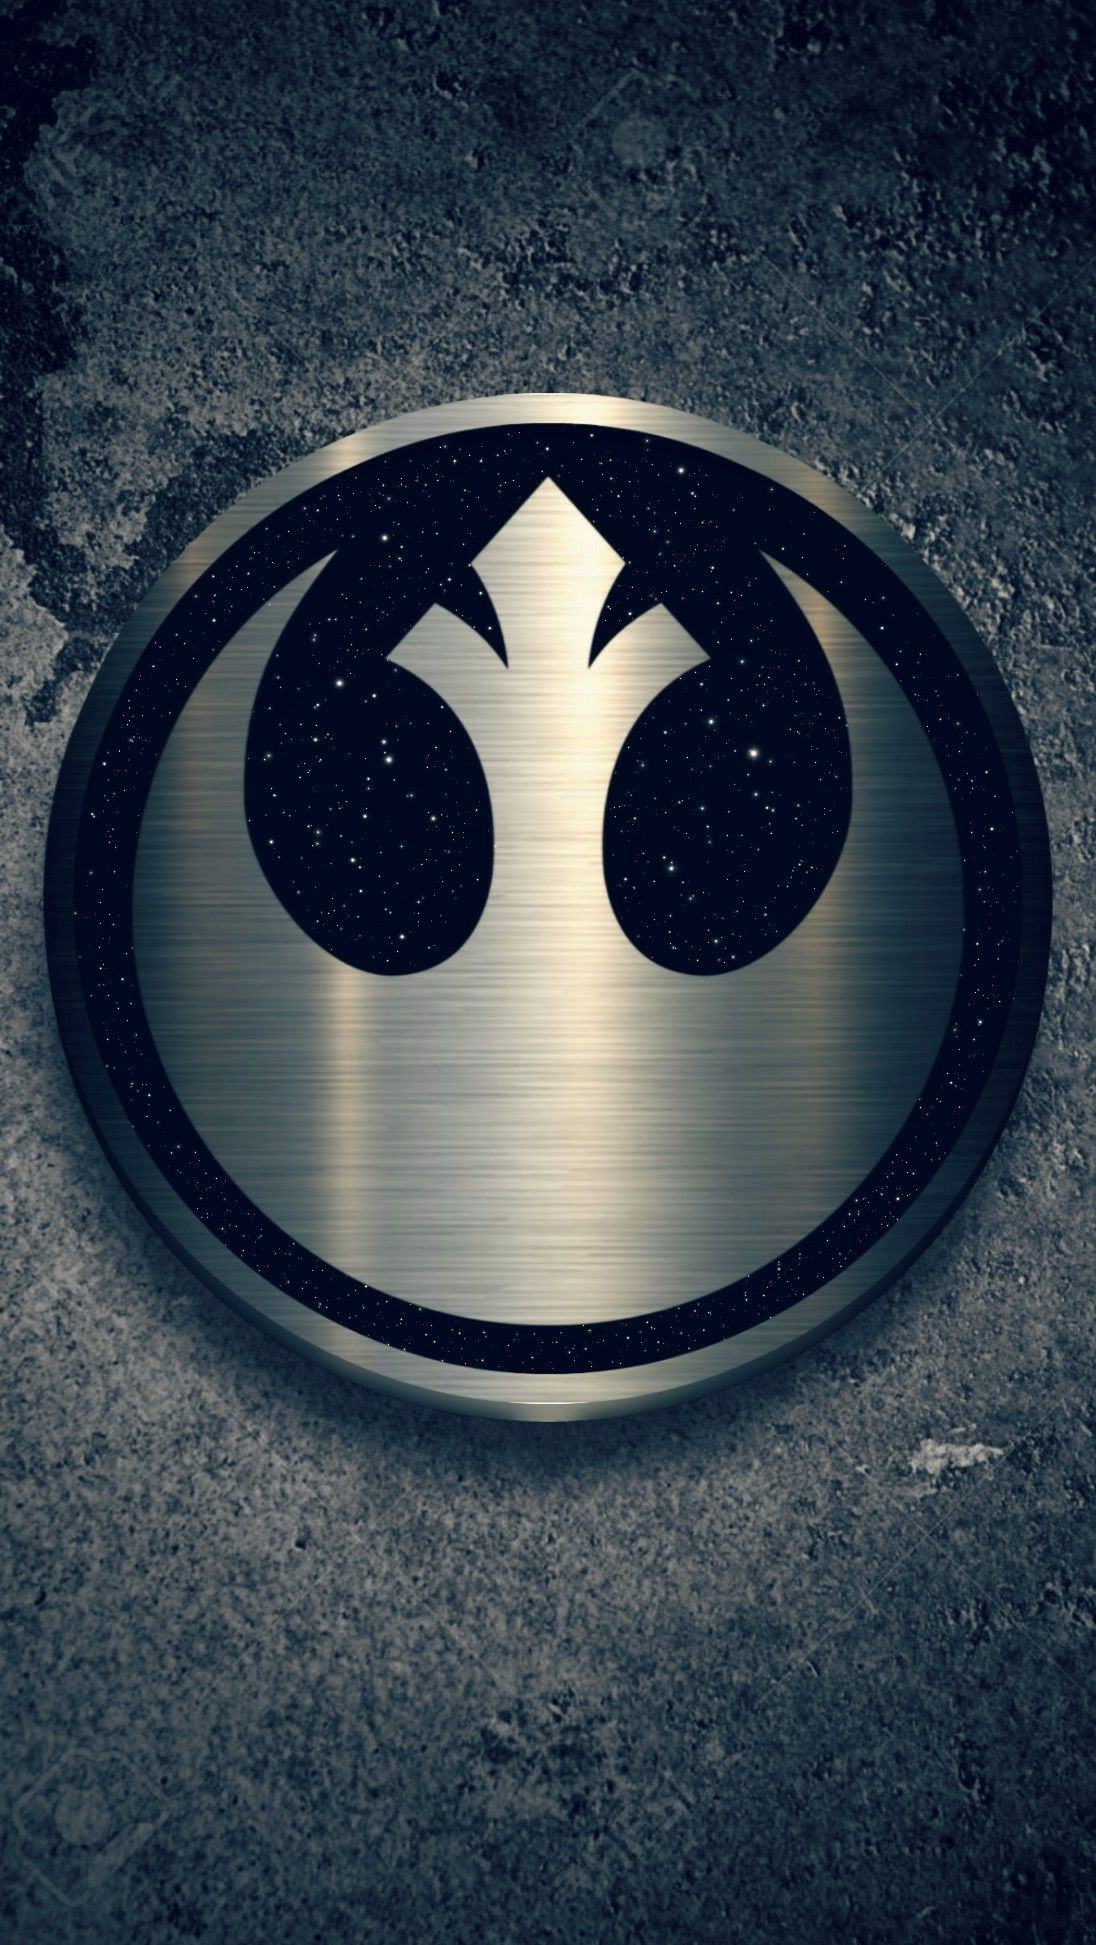 Star Wars Rebels Logo Wallpaper Star Wars Symbols Star Wars Wallpaper Star Wars Universe